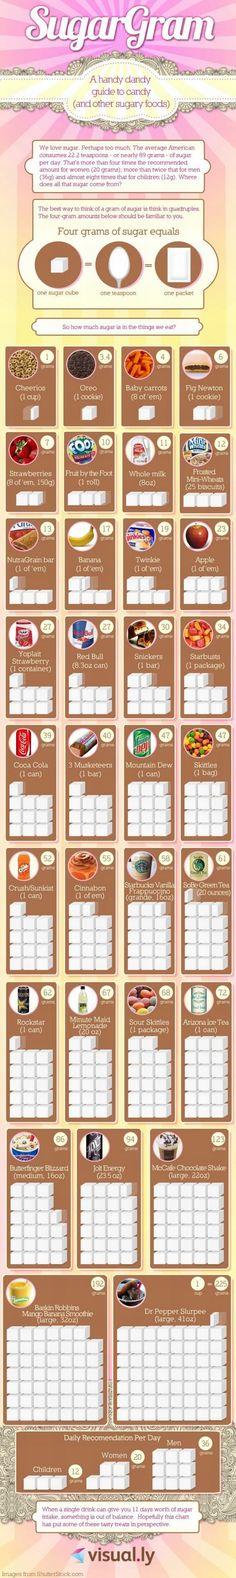 Lowdown on Sugar Grams from Ragan's Health Care Communication News